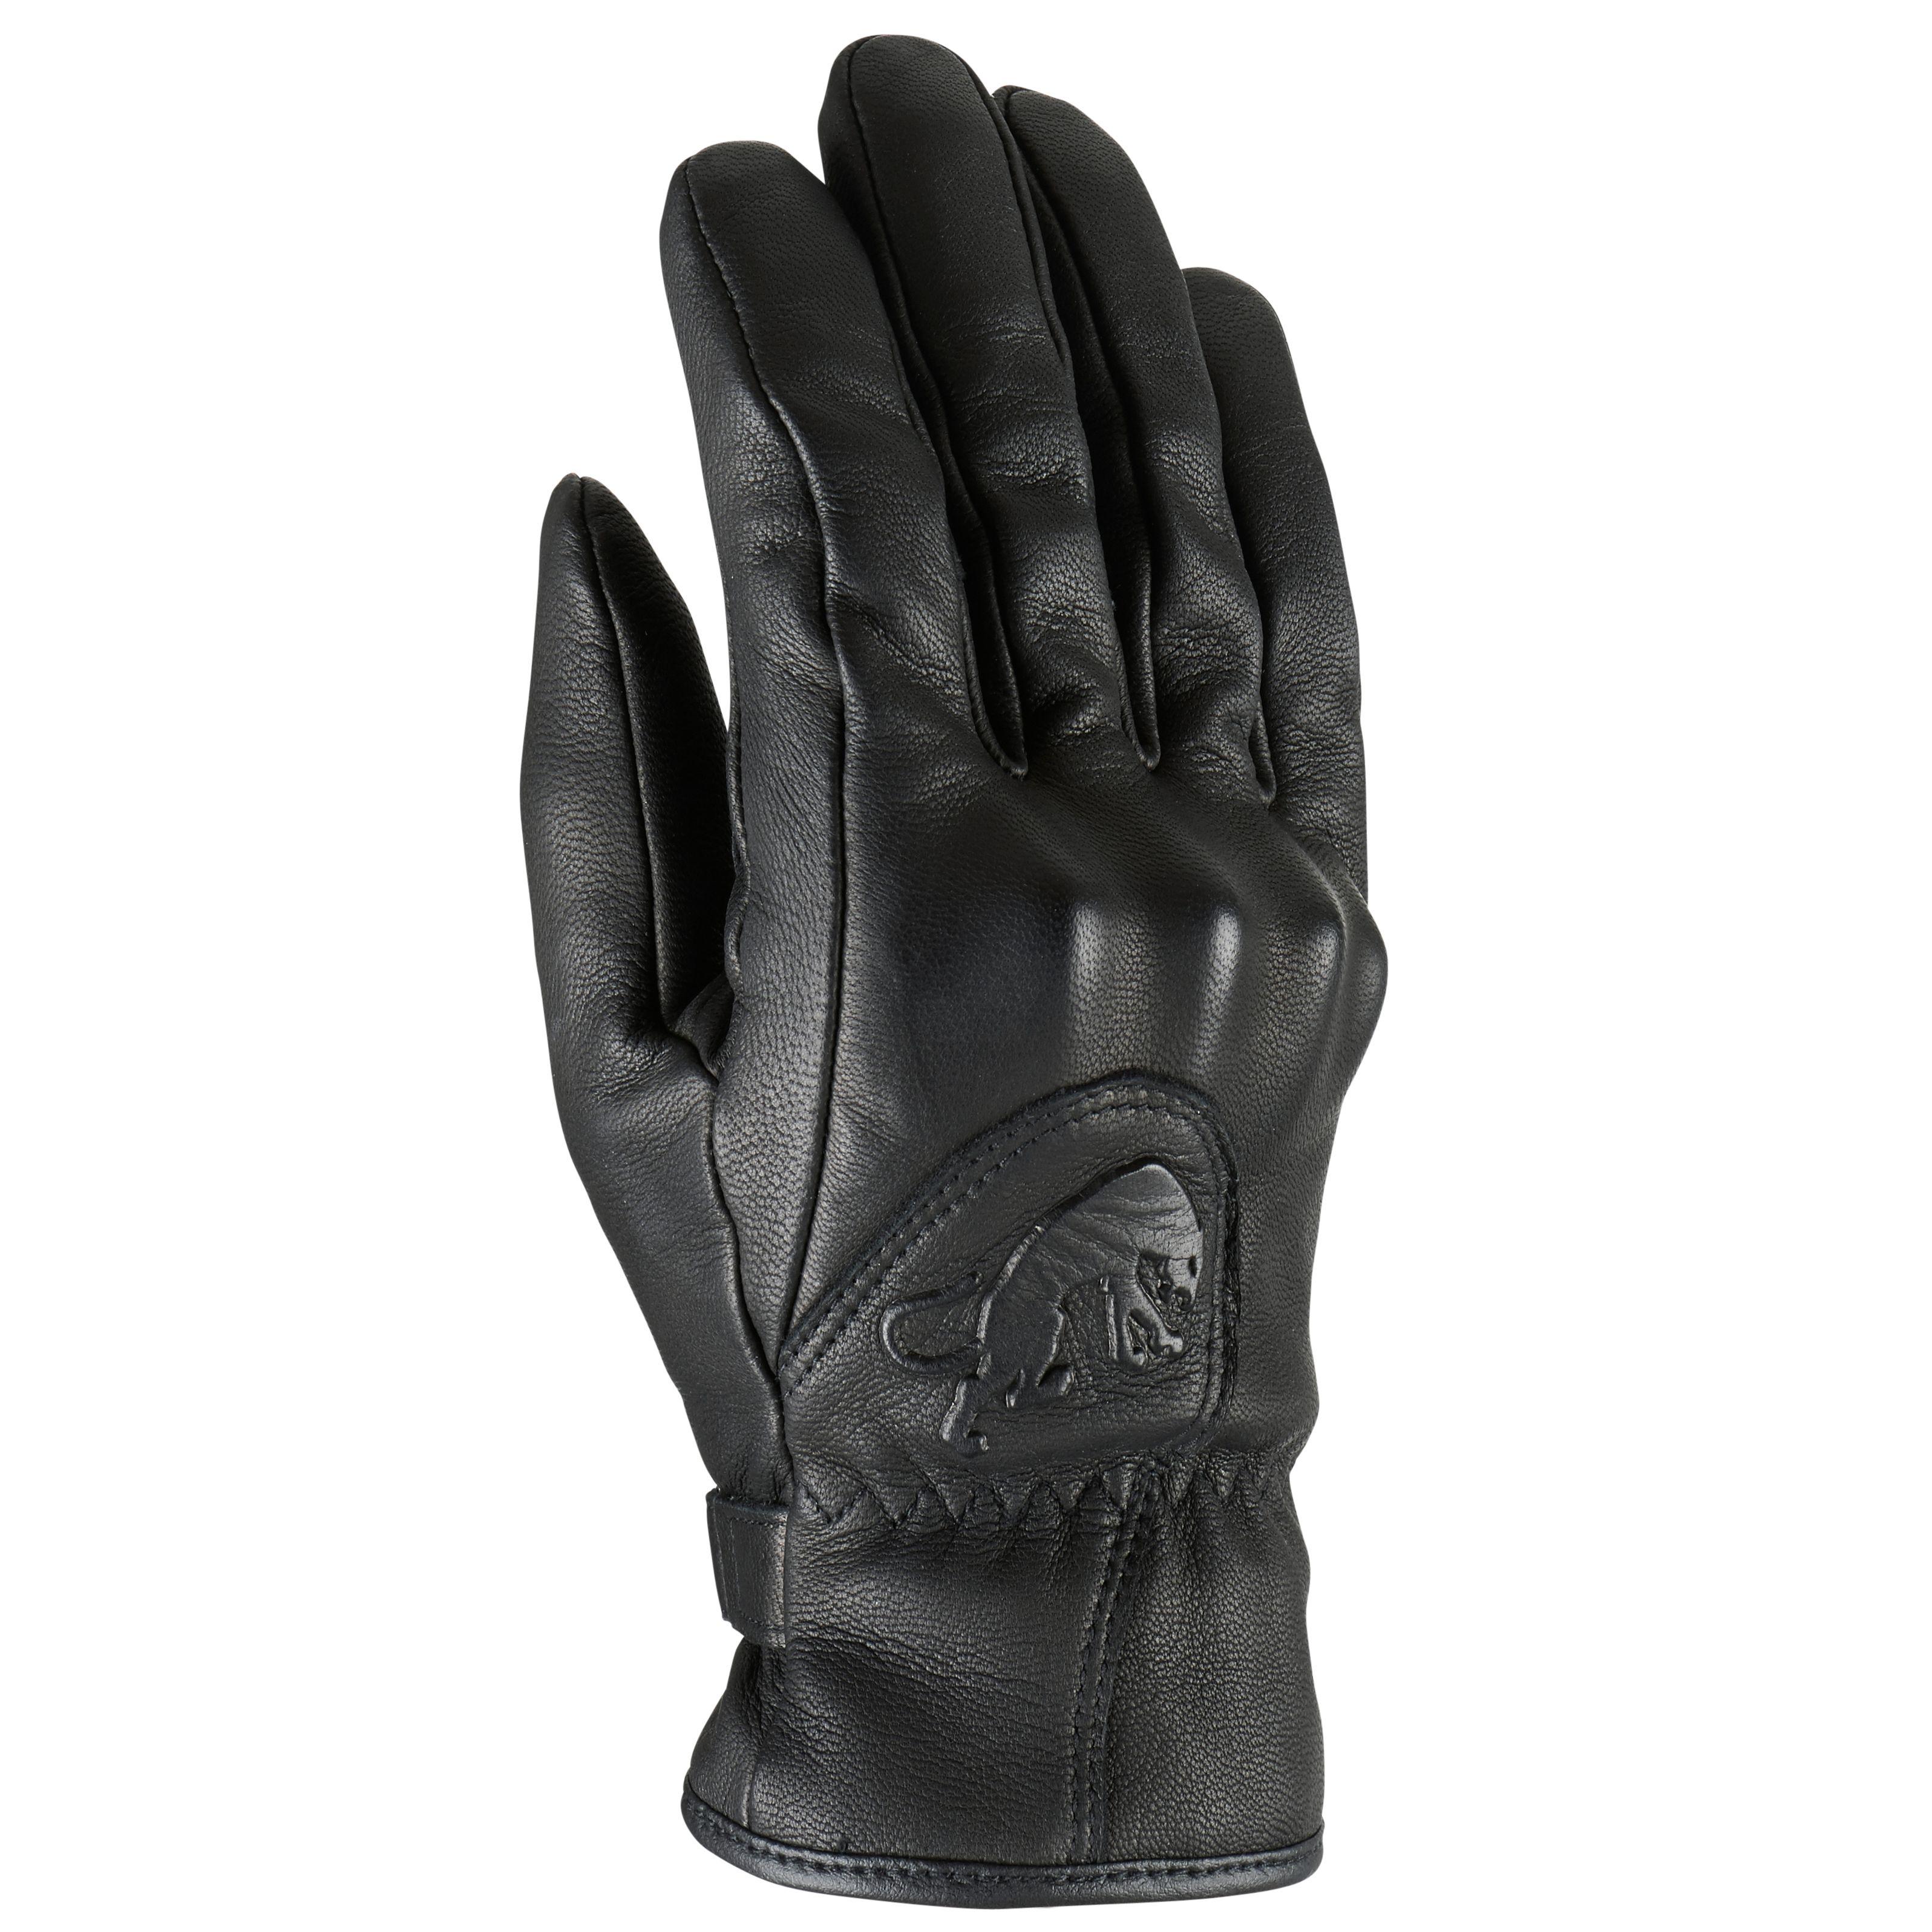 gants furygan gr lady all season gants moto. Black Bedroom Furniture Sets. Home Design Ideas